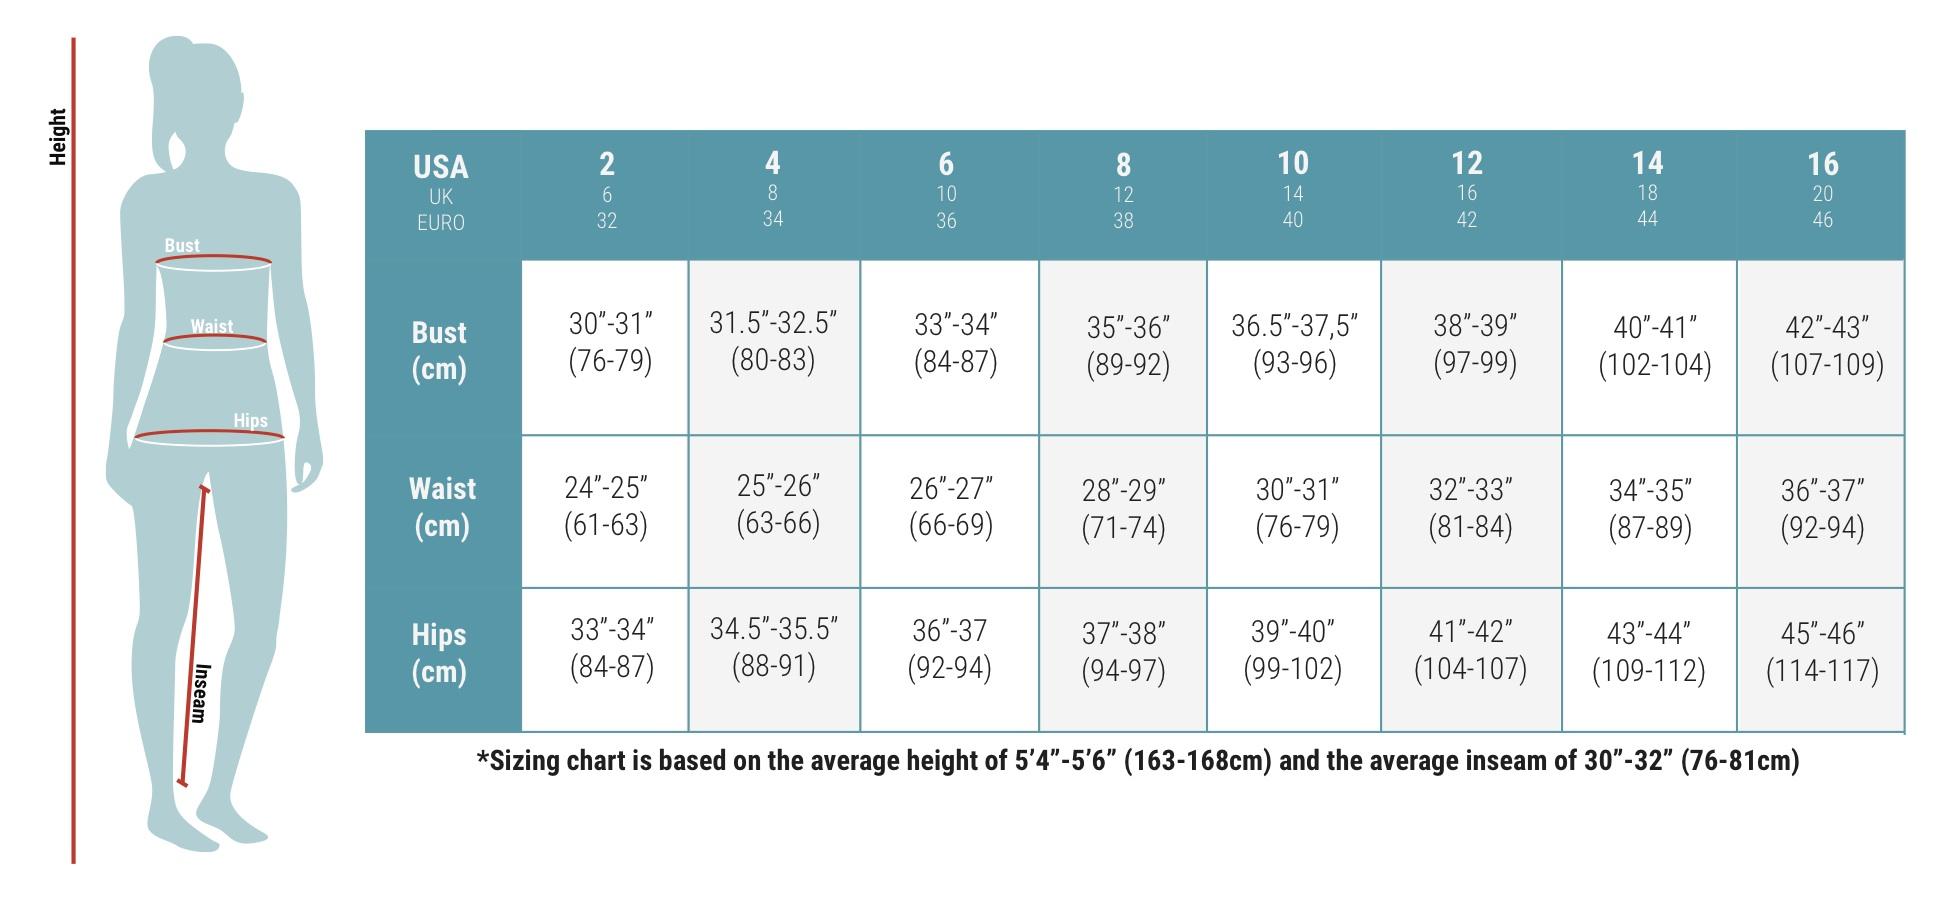 wcs-gill-womens-sizing-chart.jpg